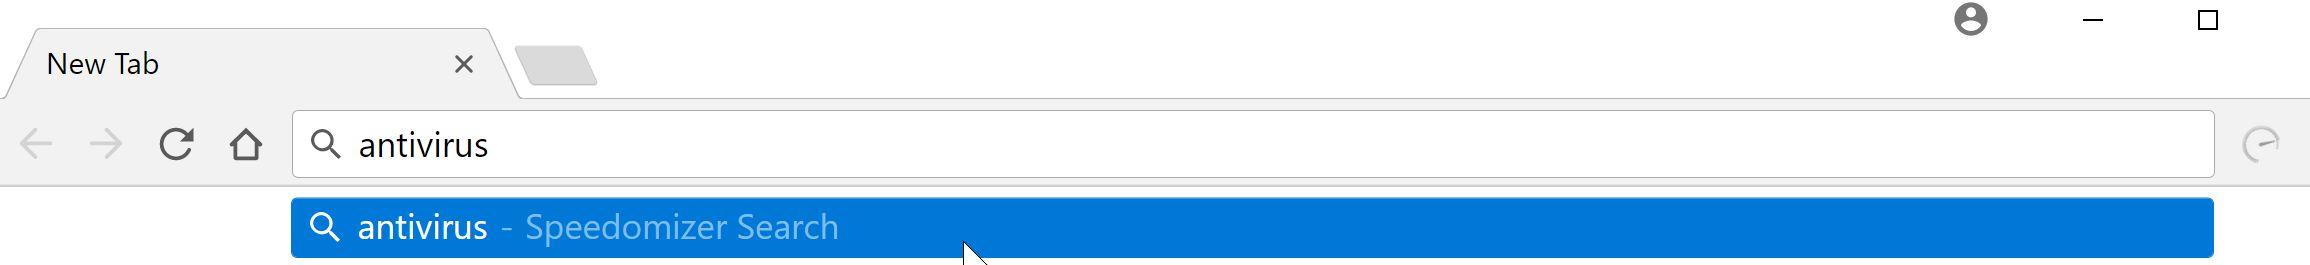 speedomizer search redirect virus